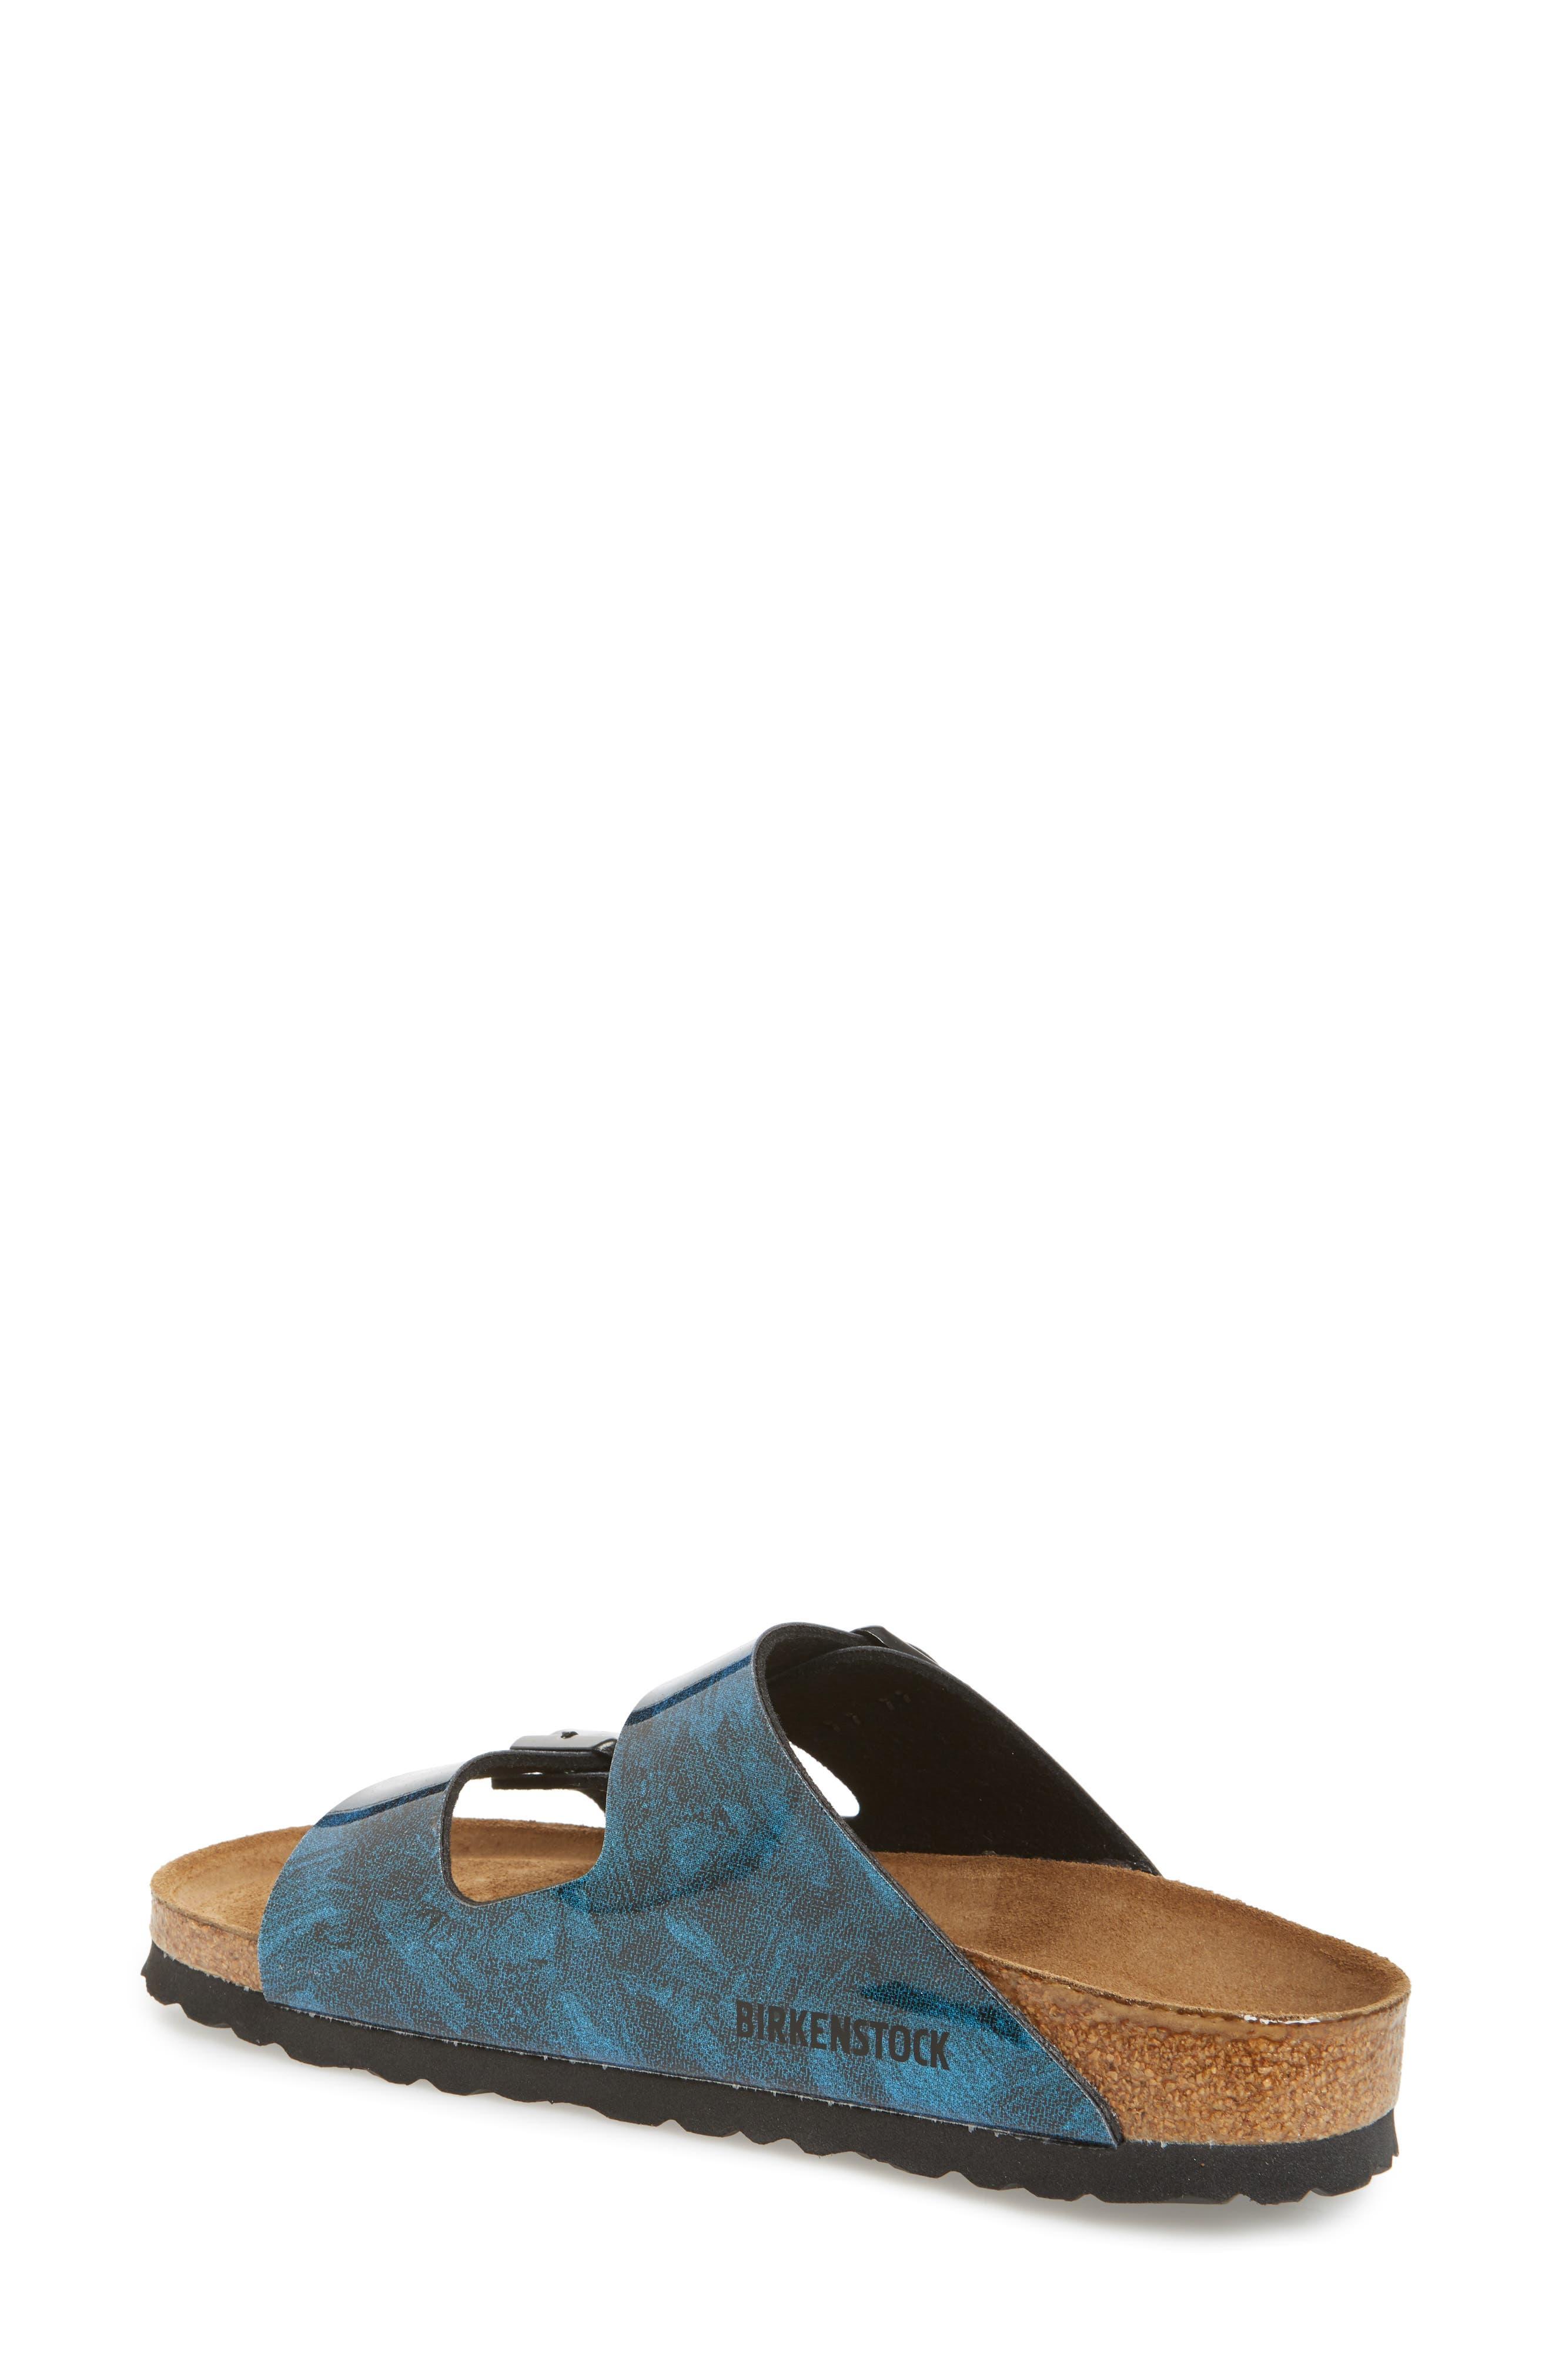 Arizona Birko-Flor Soft Footbed Sandal,                             Alternate thumbnail 2, color,                             MILKY WAY BLUE